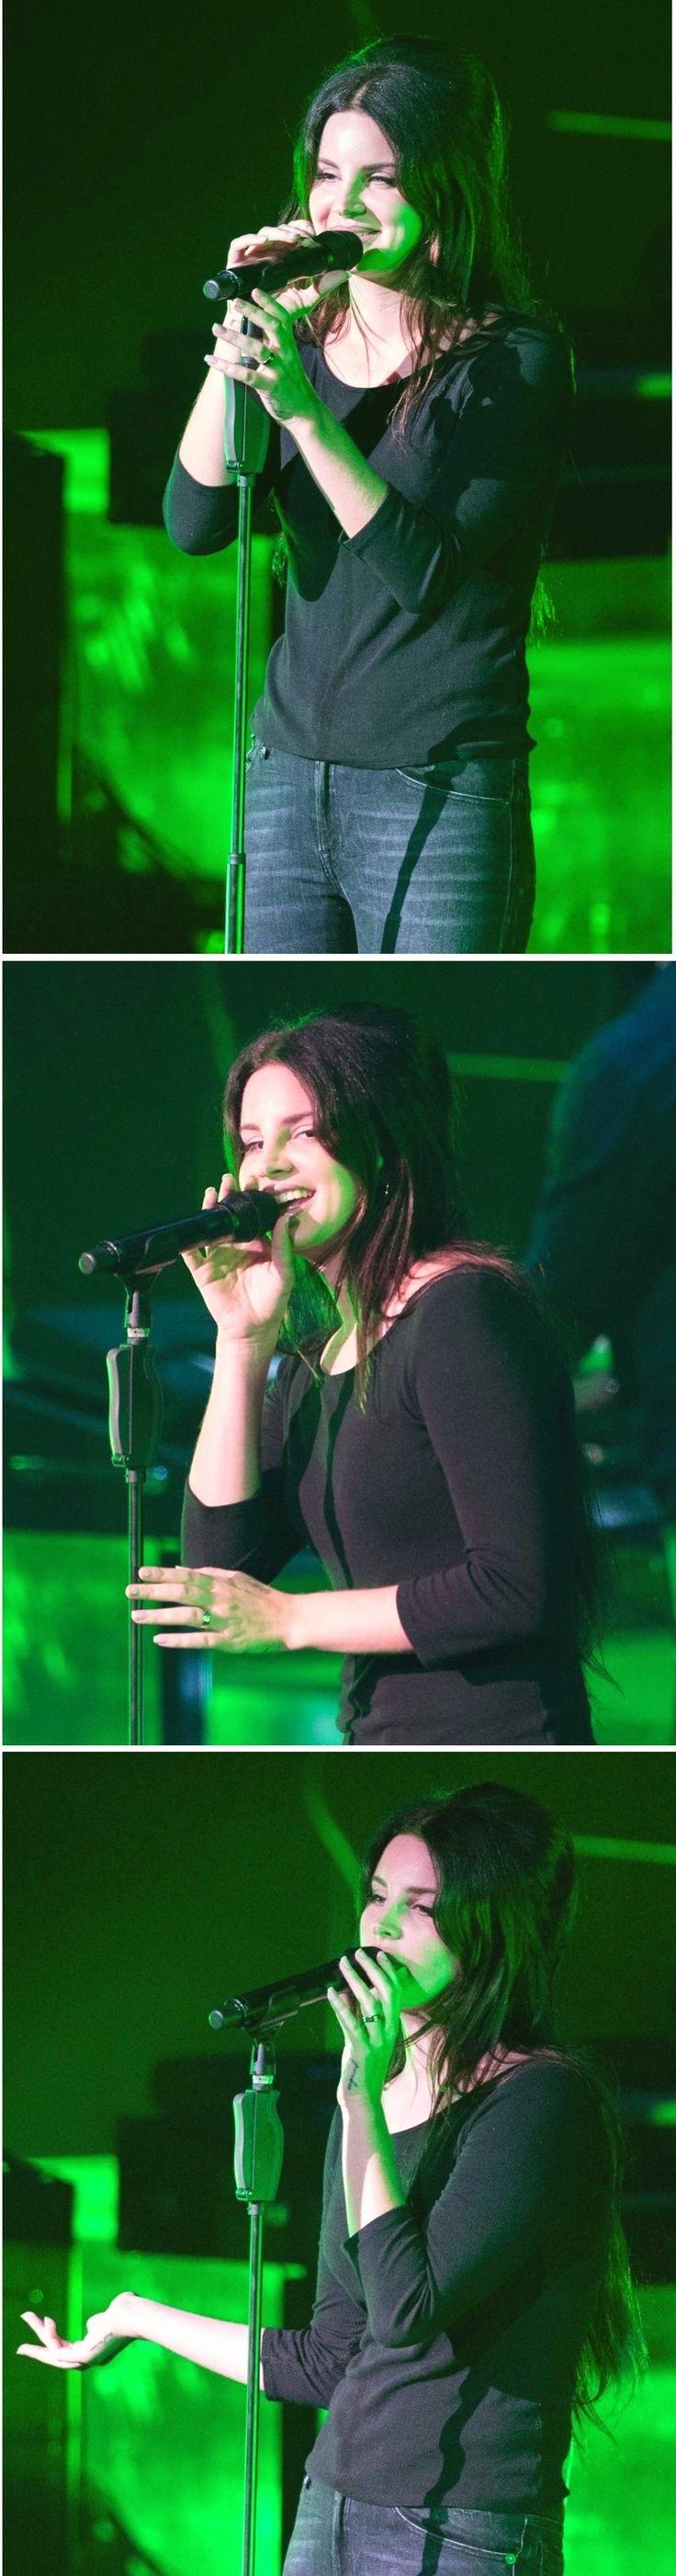 Lana Del Rey performing at 02 Brixton Academy in London #LDR